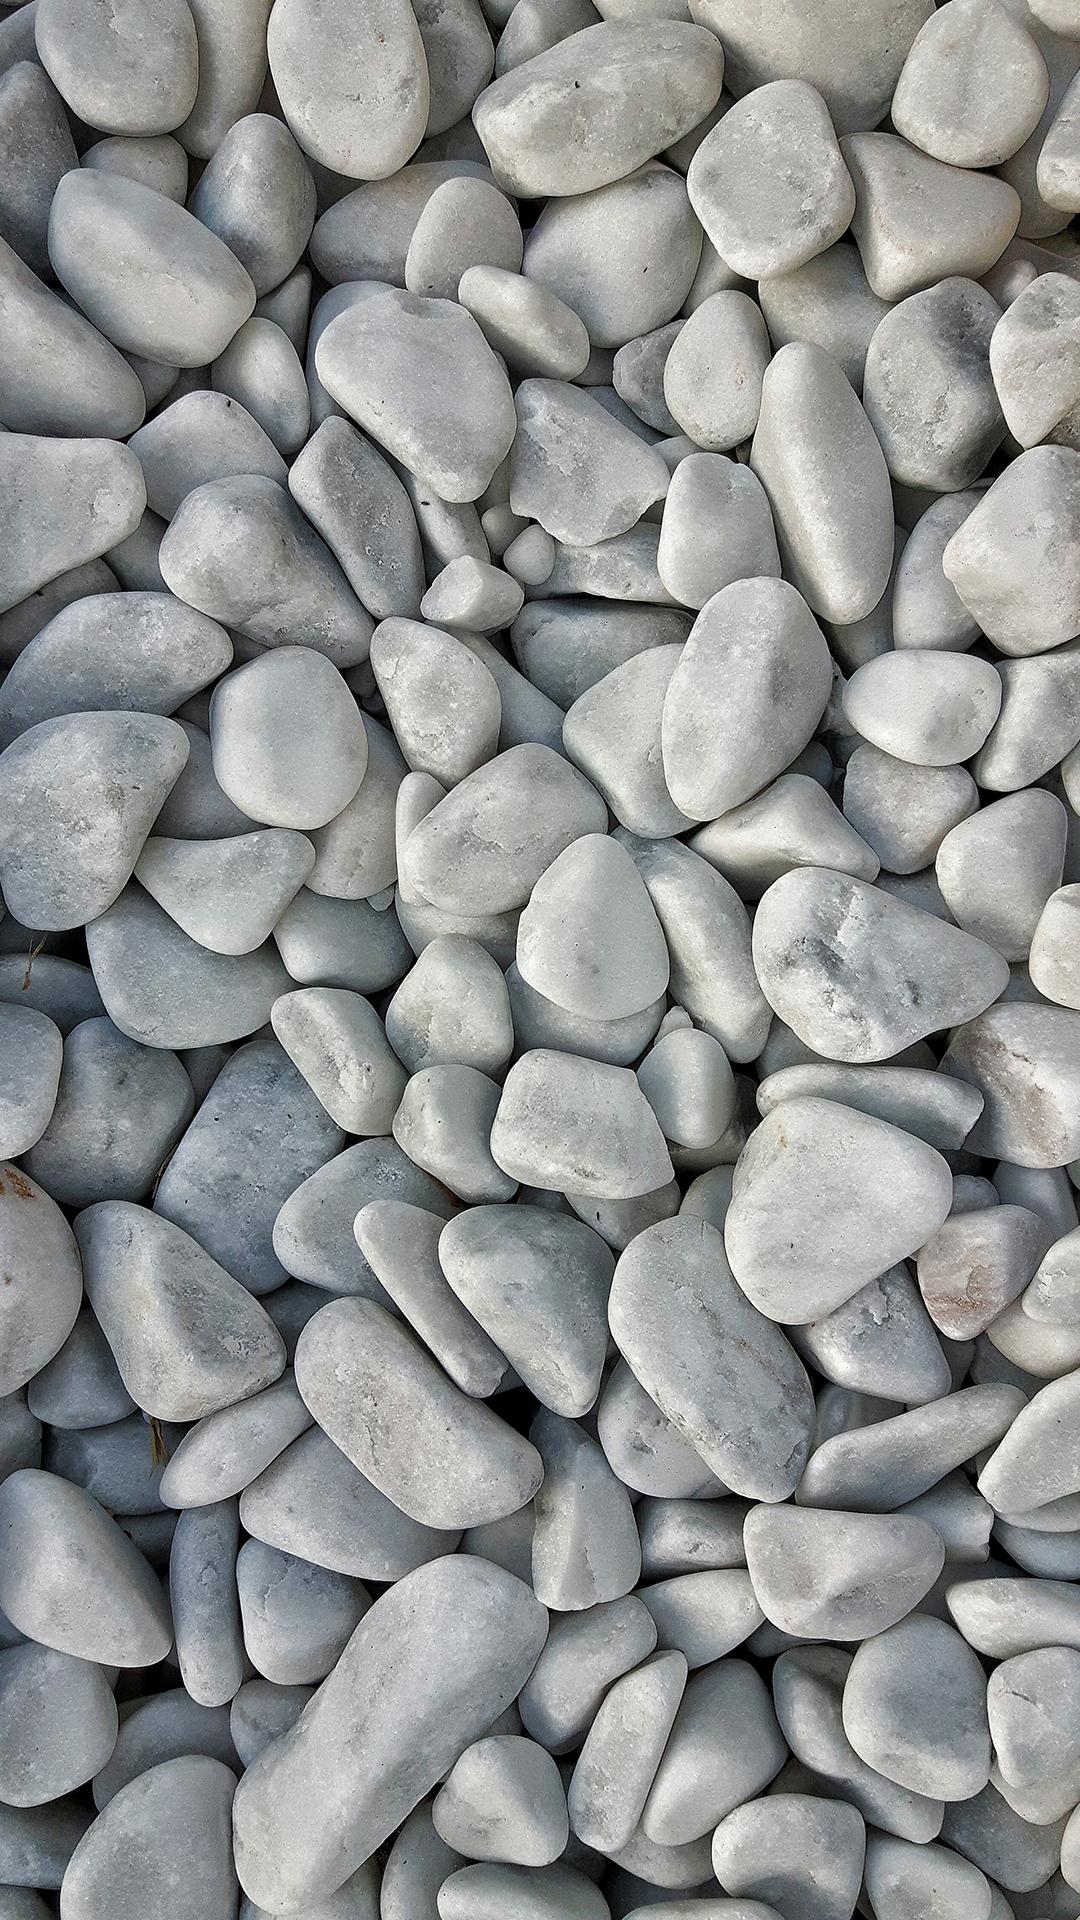 them-stones-3352